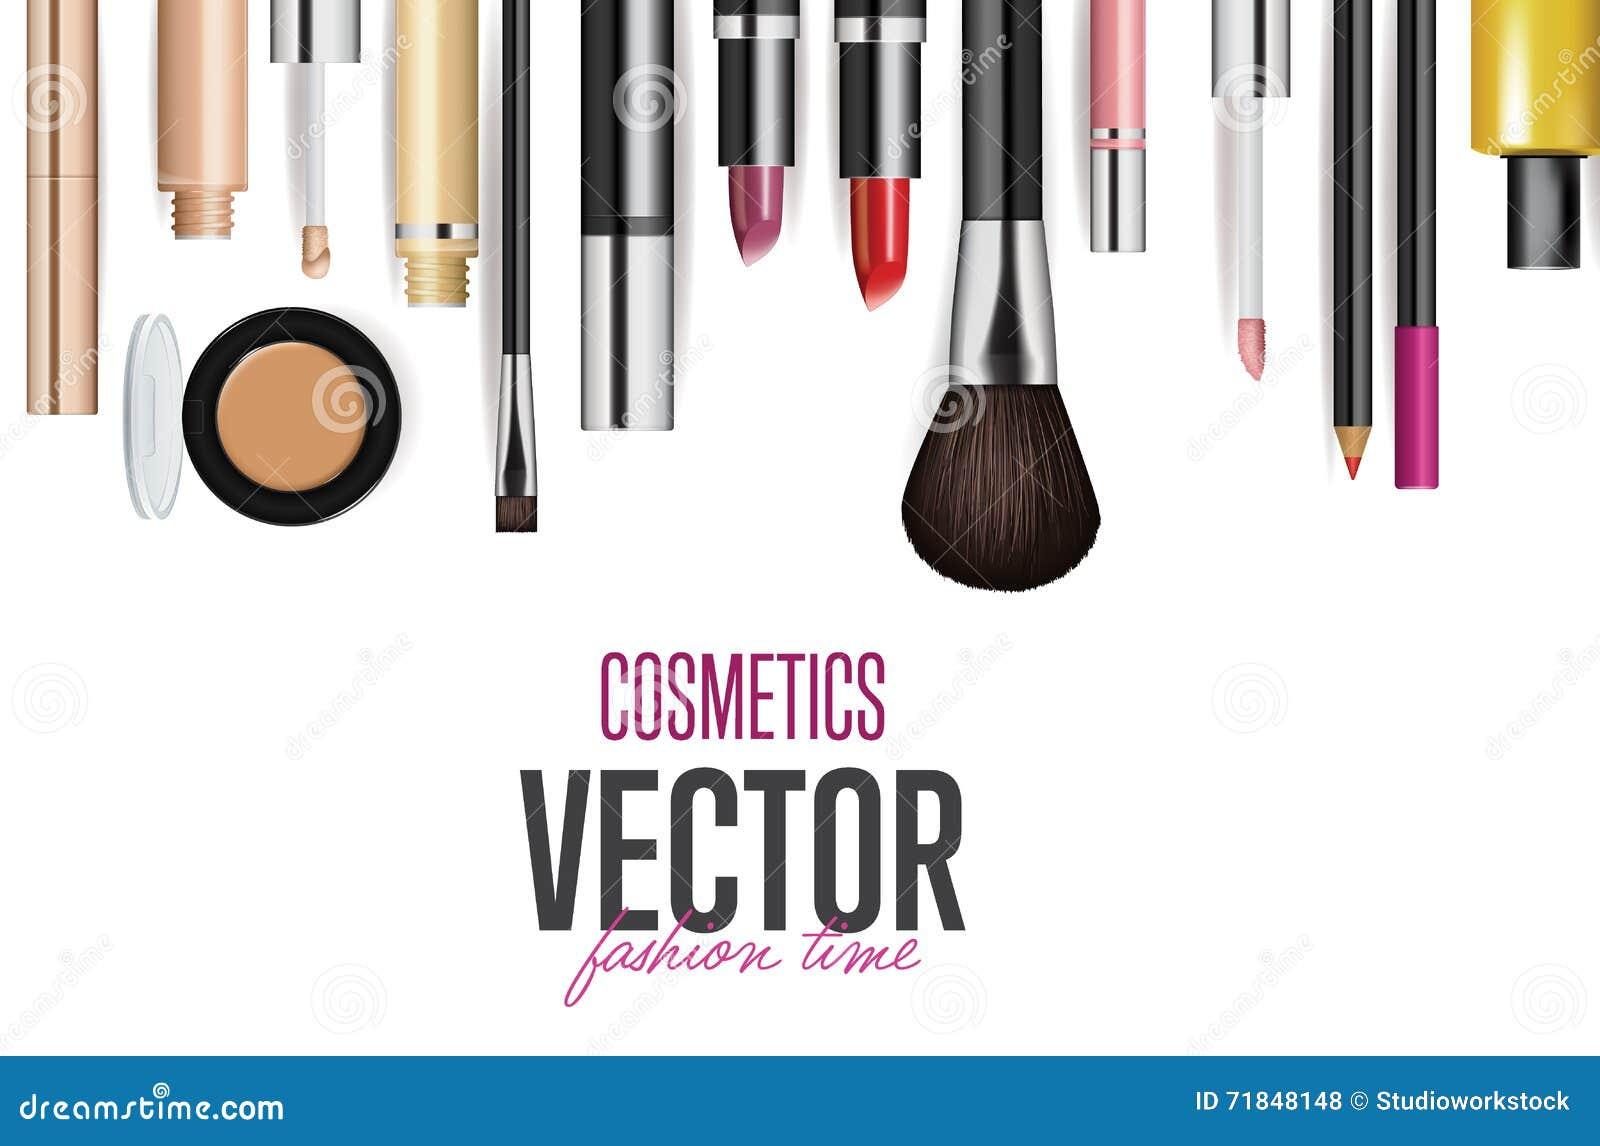 Fashion Cosmetics Background Cartoon Vector